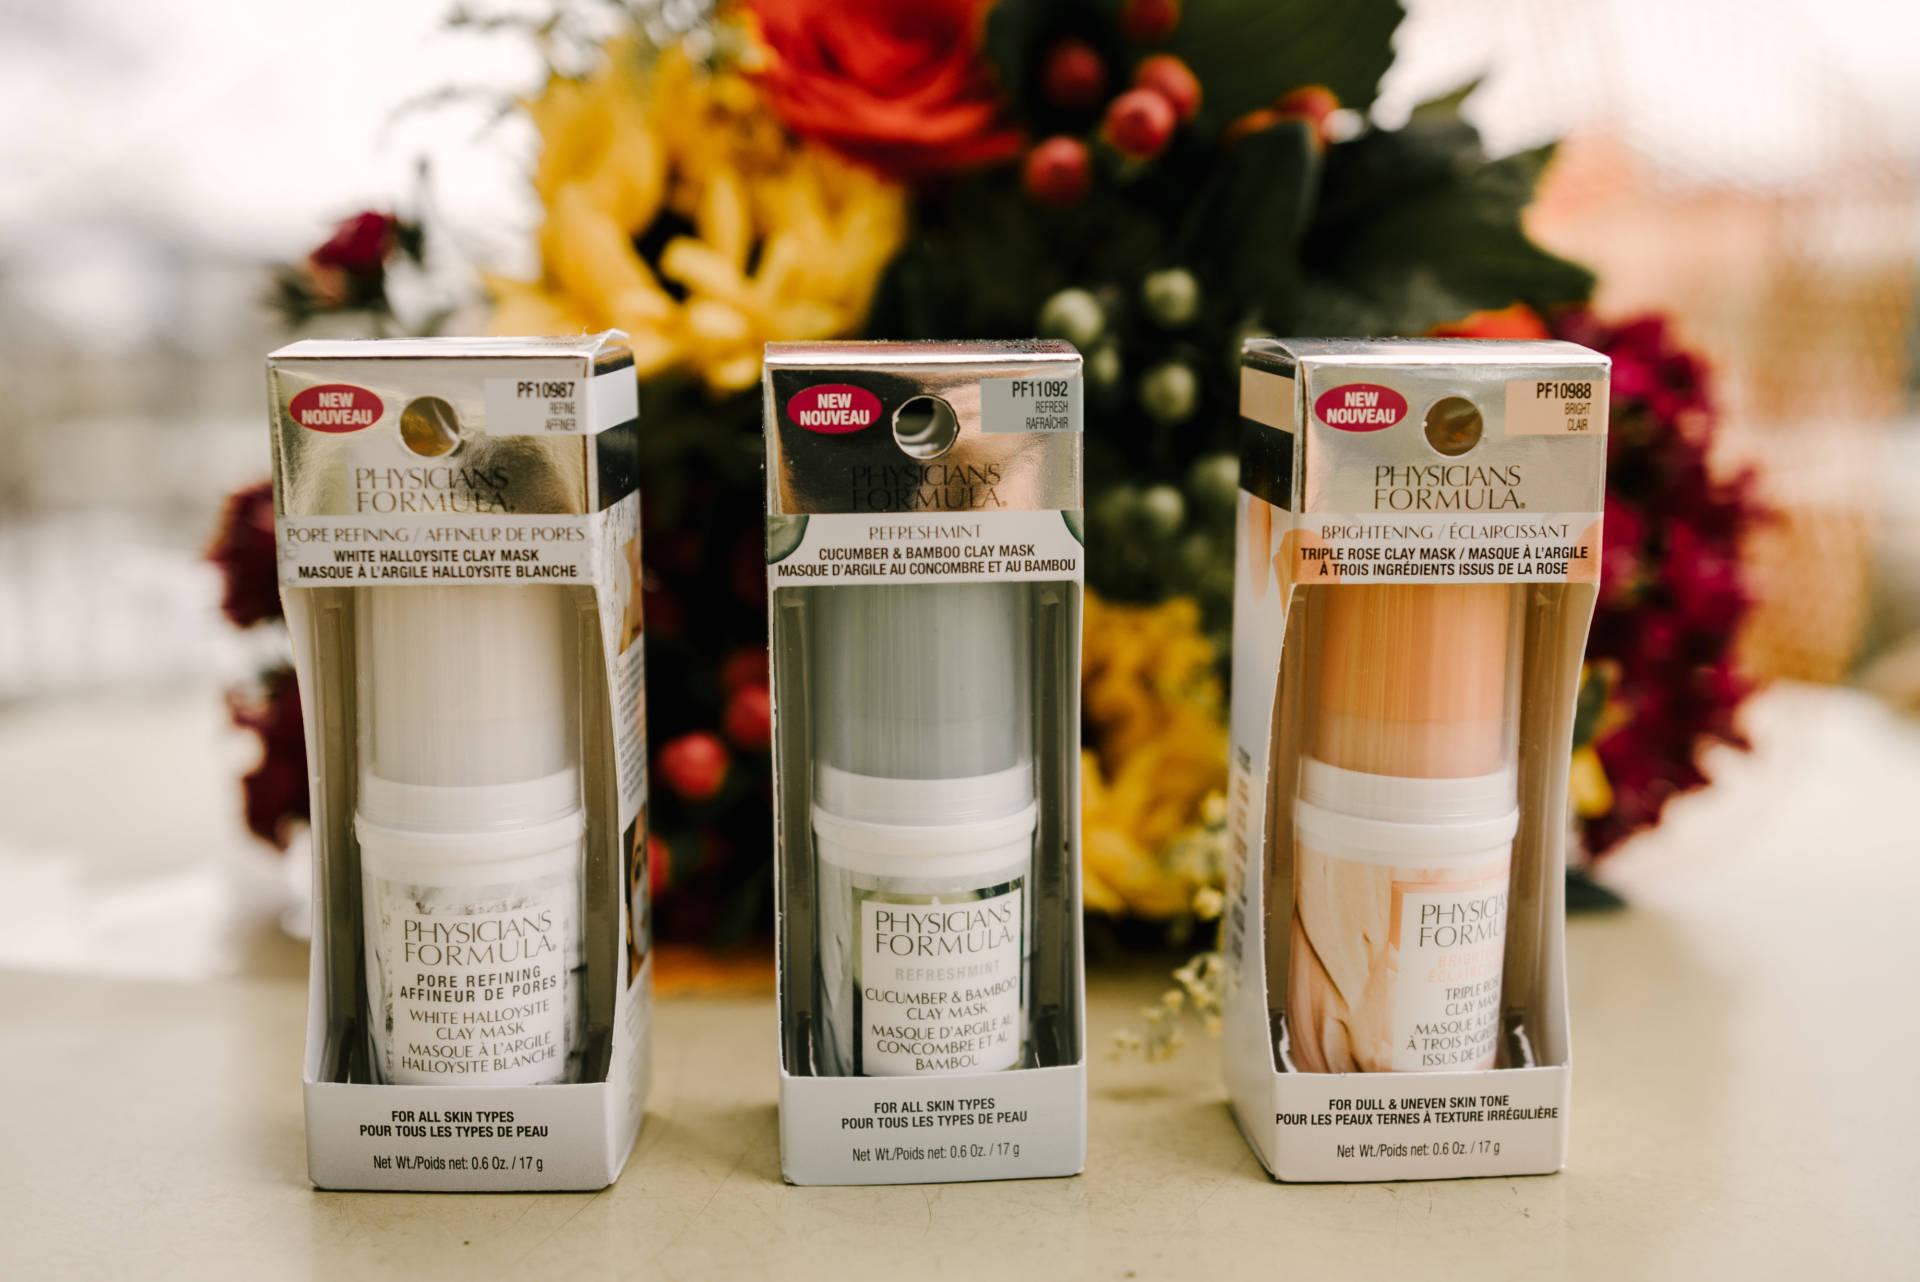 Ruthie Ridley Blog: Physicians Formula- Walmart Exclusive Skin Treatment